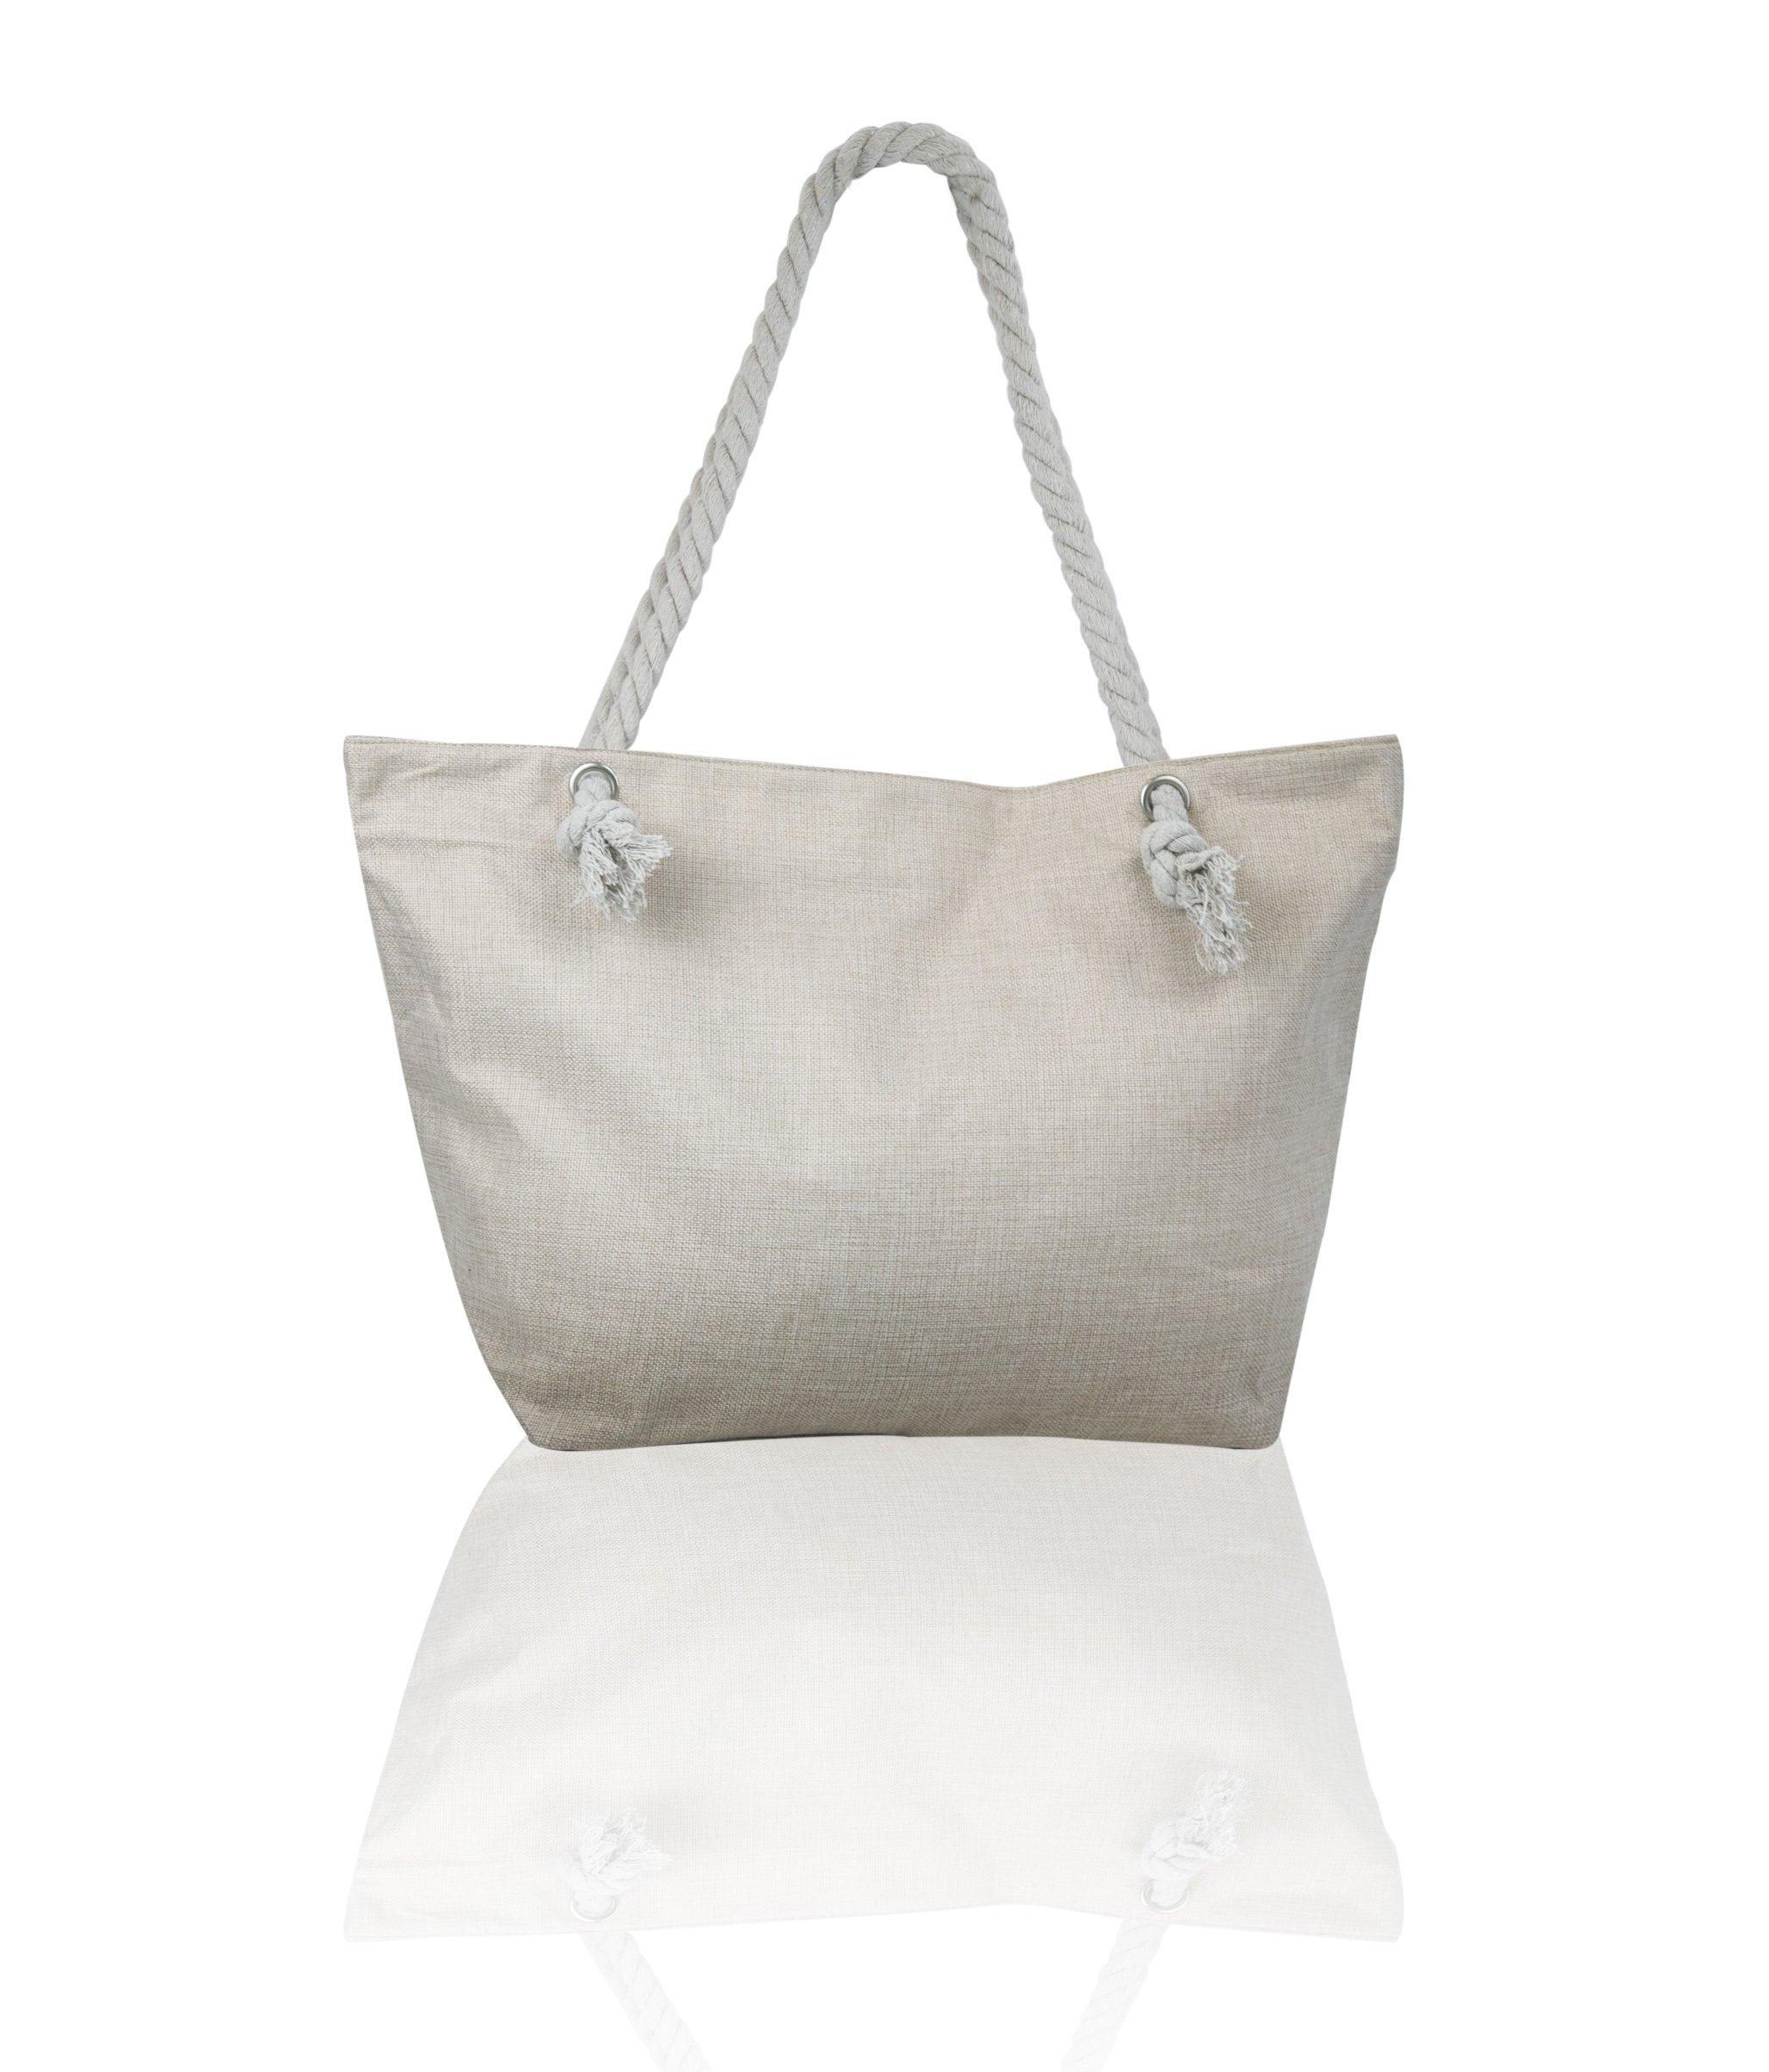 JJMG NEW Summer Beach Bag Stroller Friendly Women's Large Capacity Mom's Tote Beach Shoulder Bag With Rope Handles –Shopping Bag, Diaper Bag, Yoga Bag, Toys, Towels, Swim Suits, etc. by JJMG (Image #3)